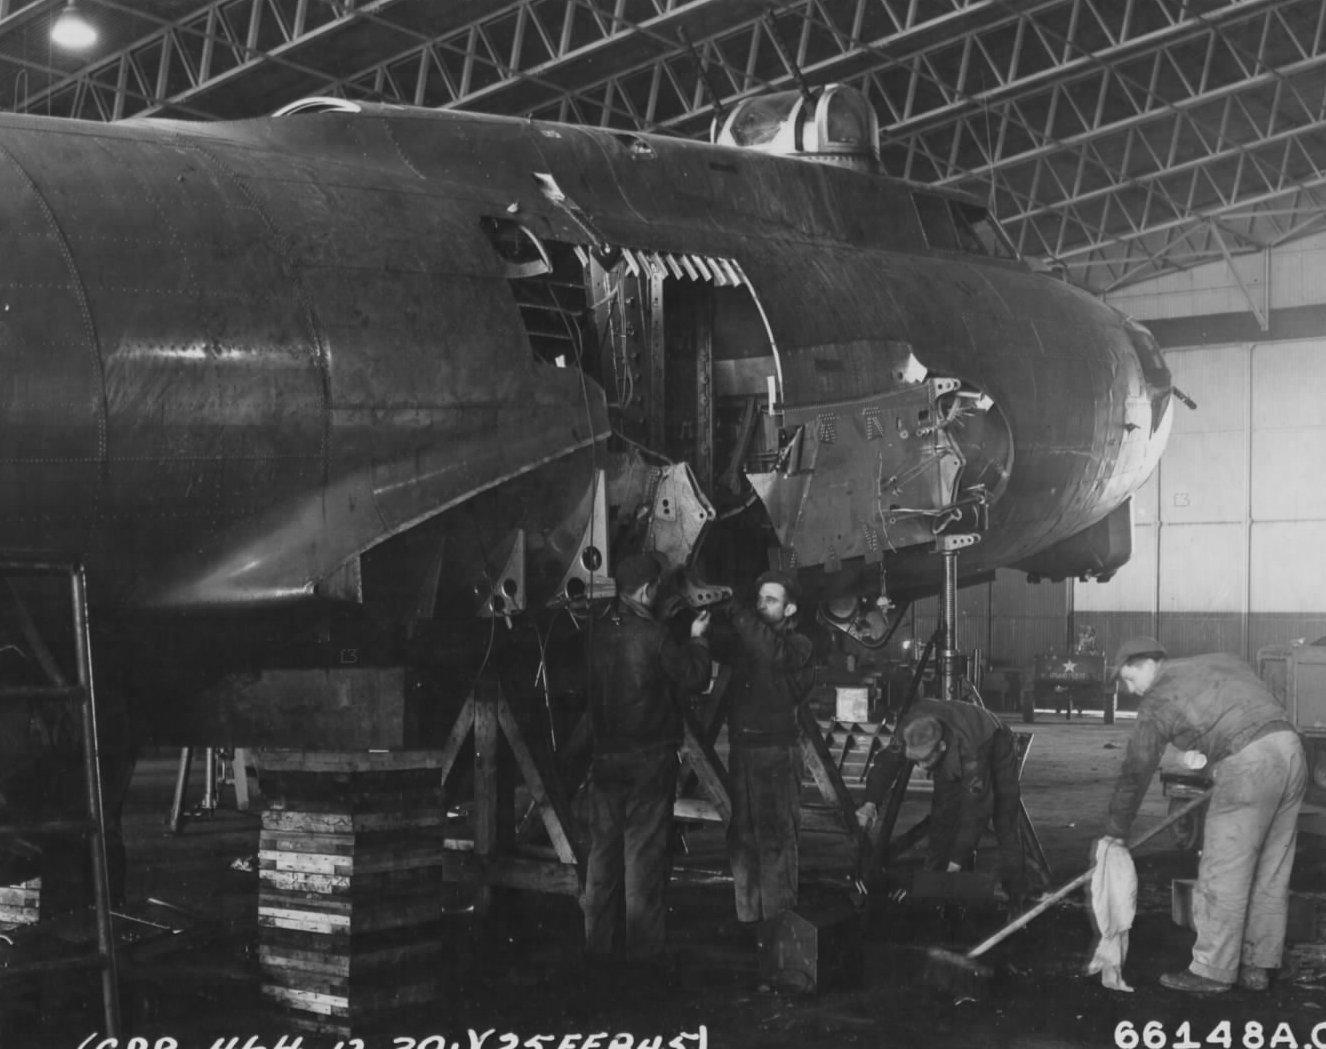 B-17 #43-38771